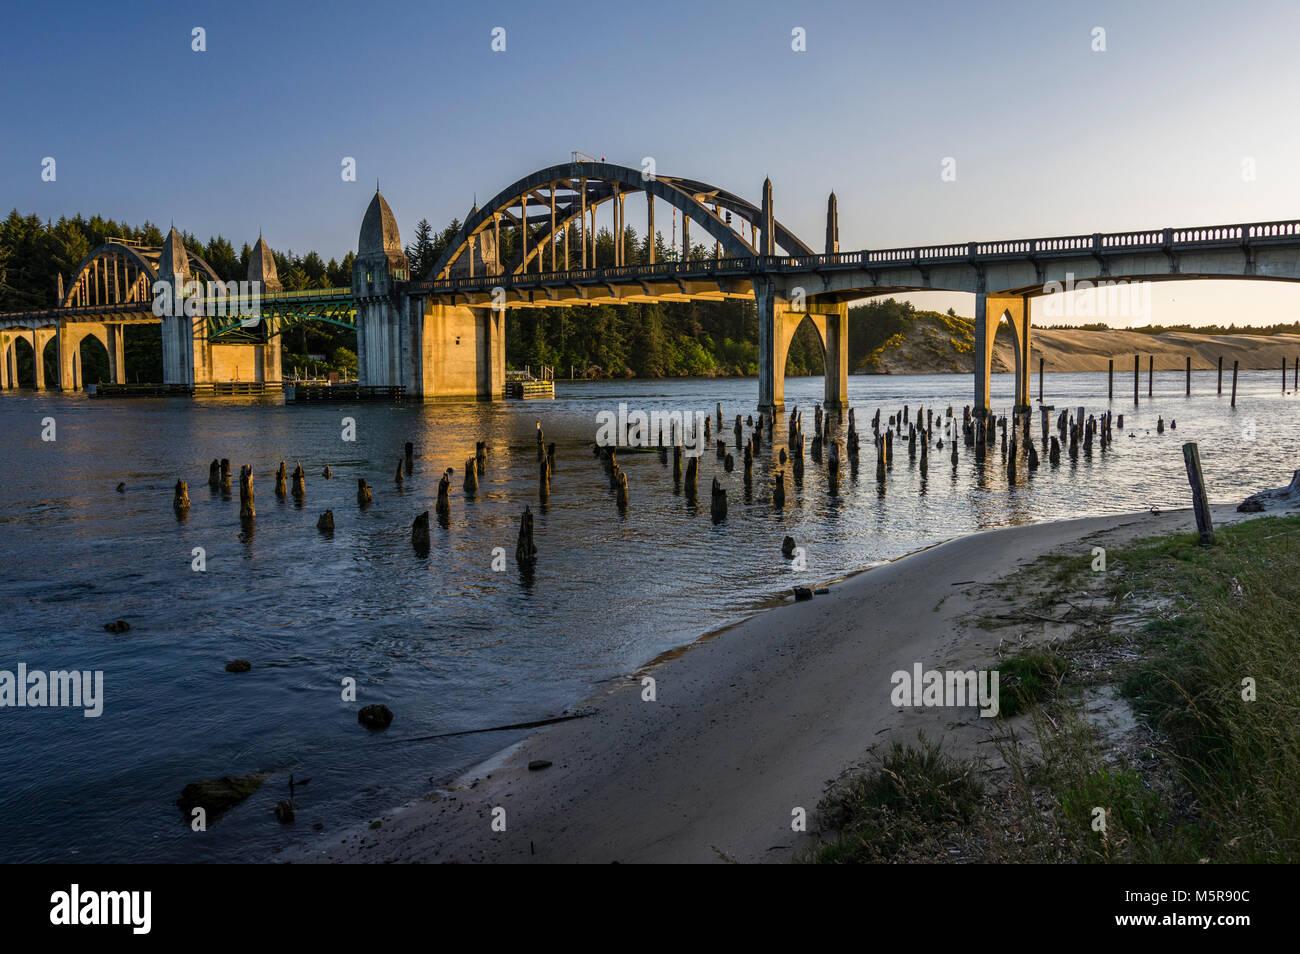 Siuslaw River Bridge in Florenz Oregon trägt uns 101 über die siuslaw River Stockbild